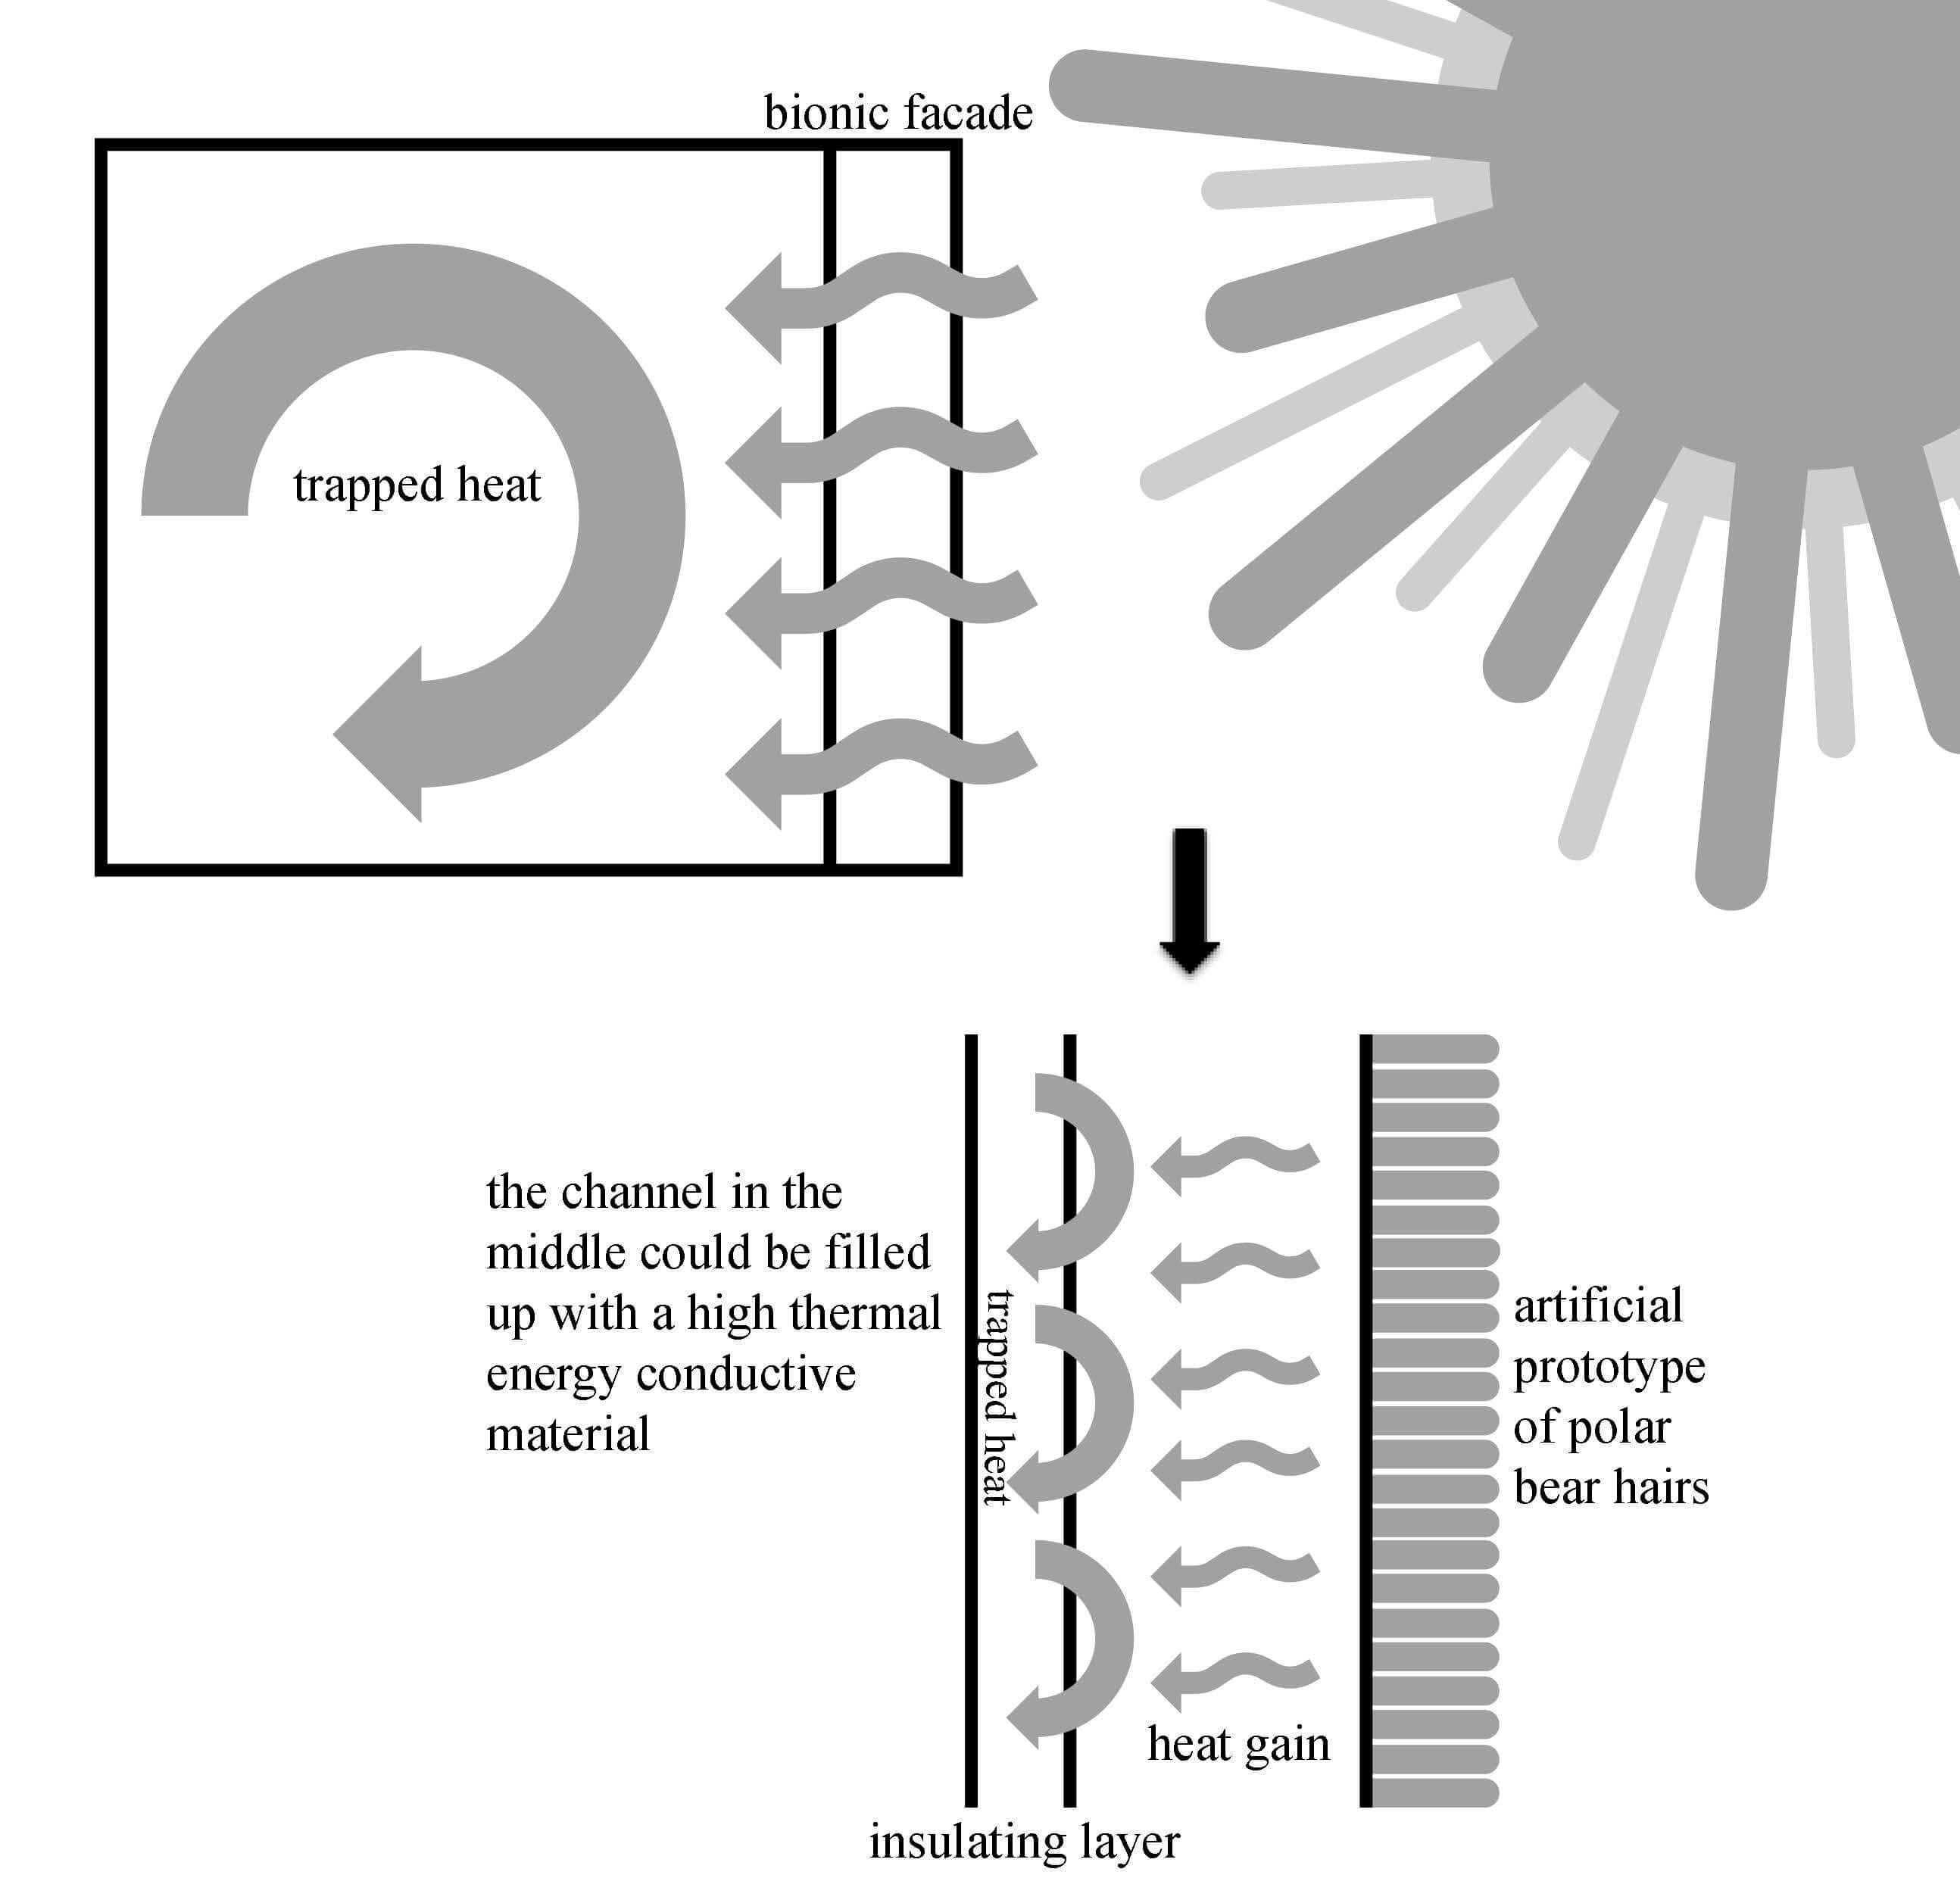 polar bear fur diagram briggs and stratton lawn mower parts 25467 usbdata